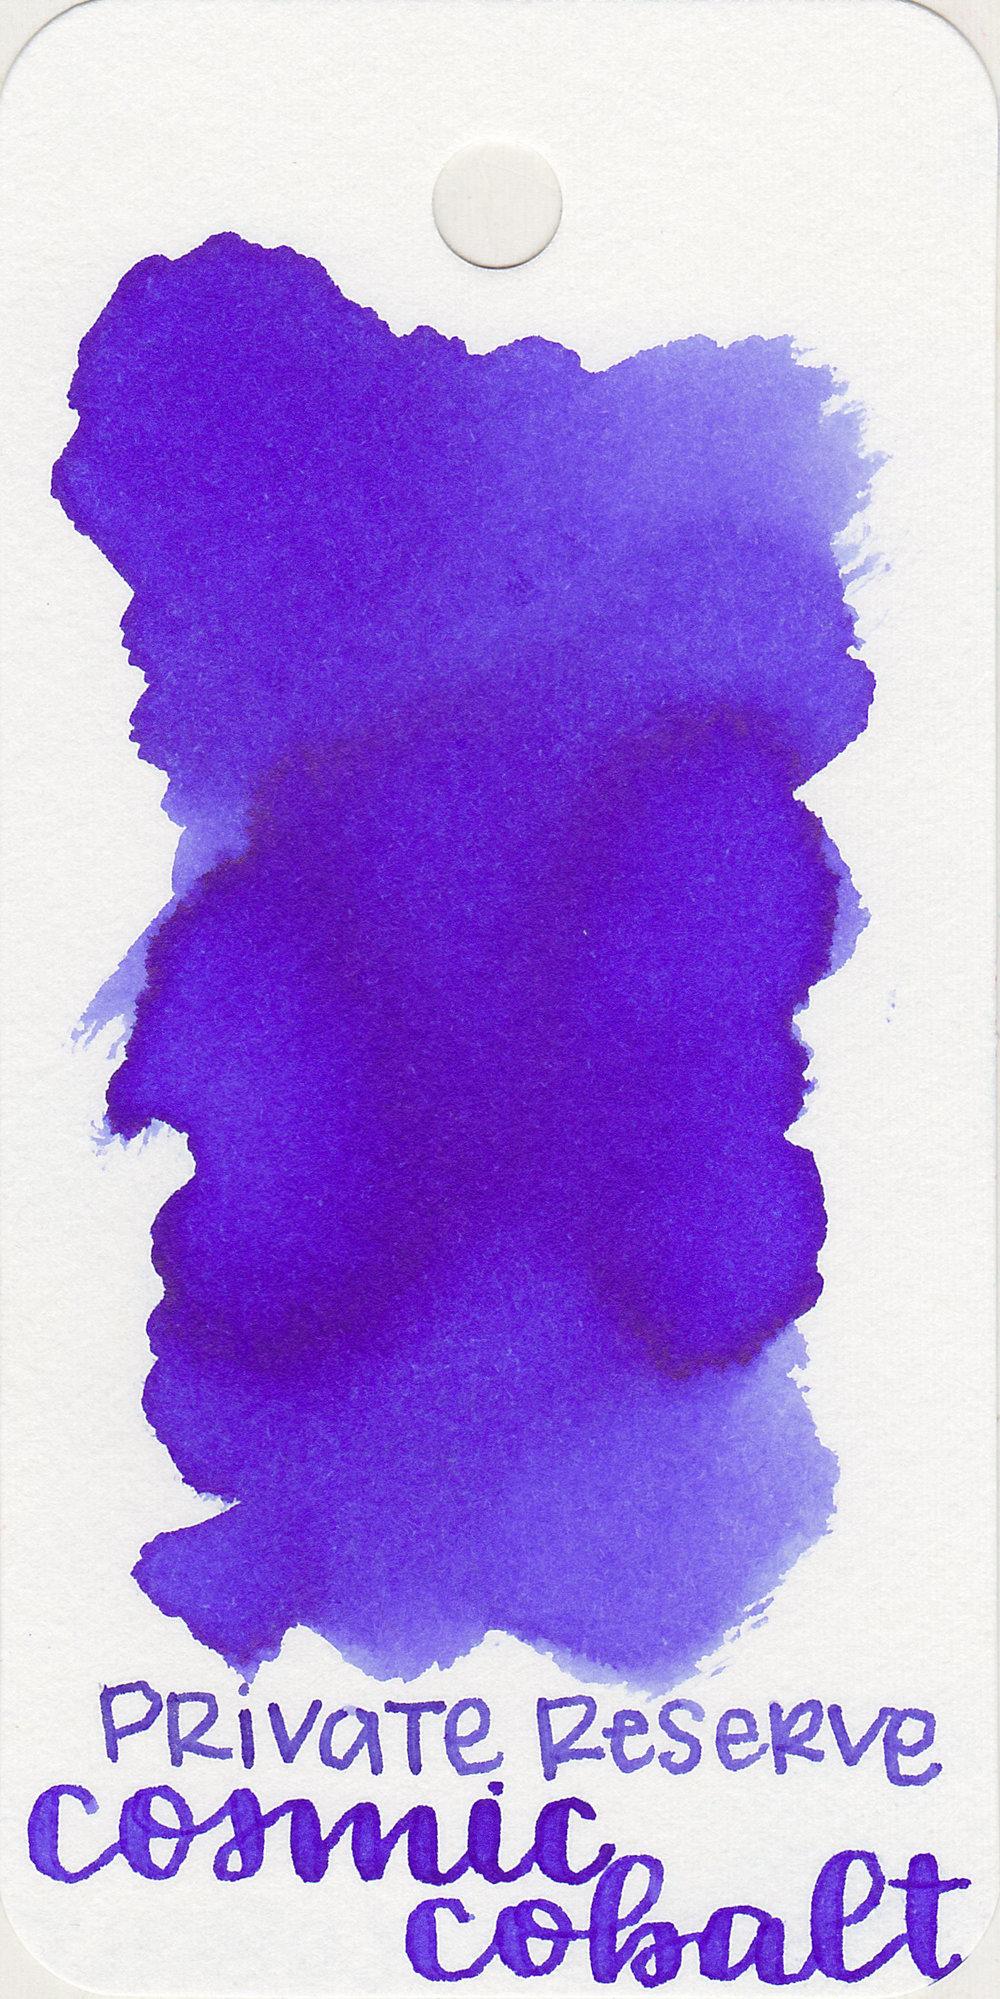 pr-cosmic-cobalt-1.jpg